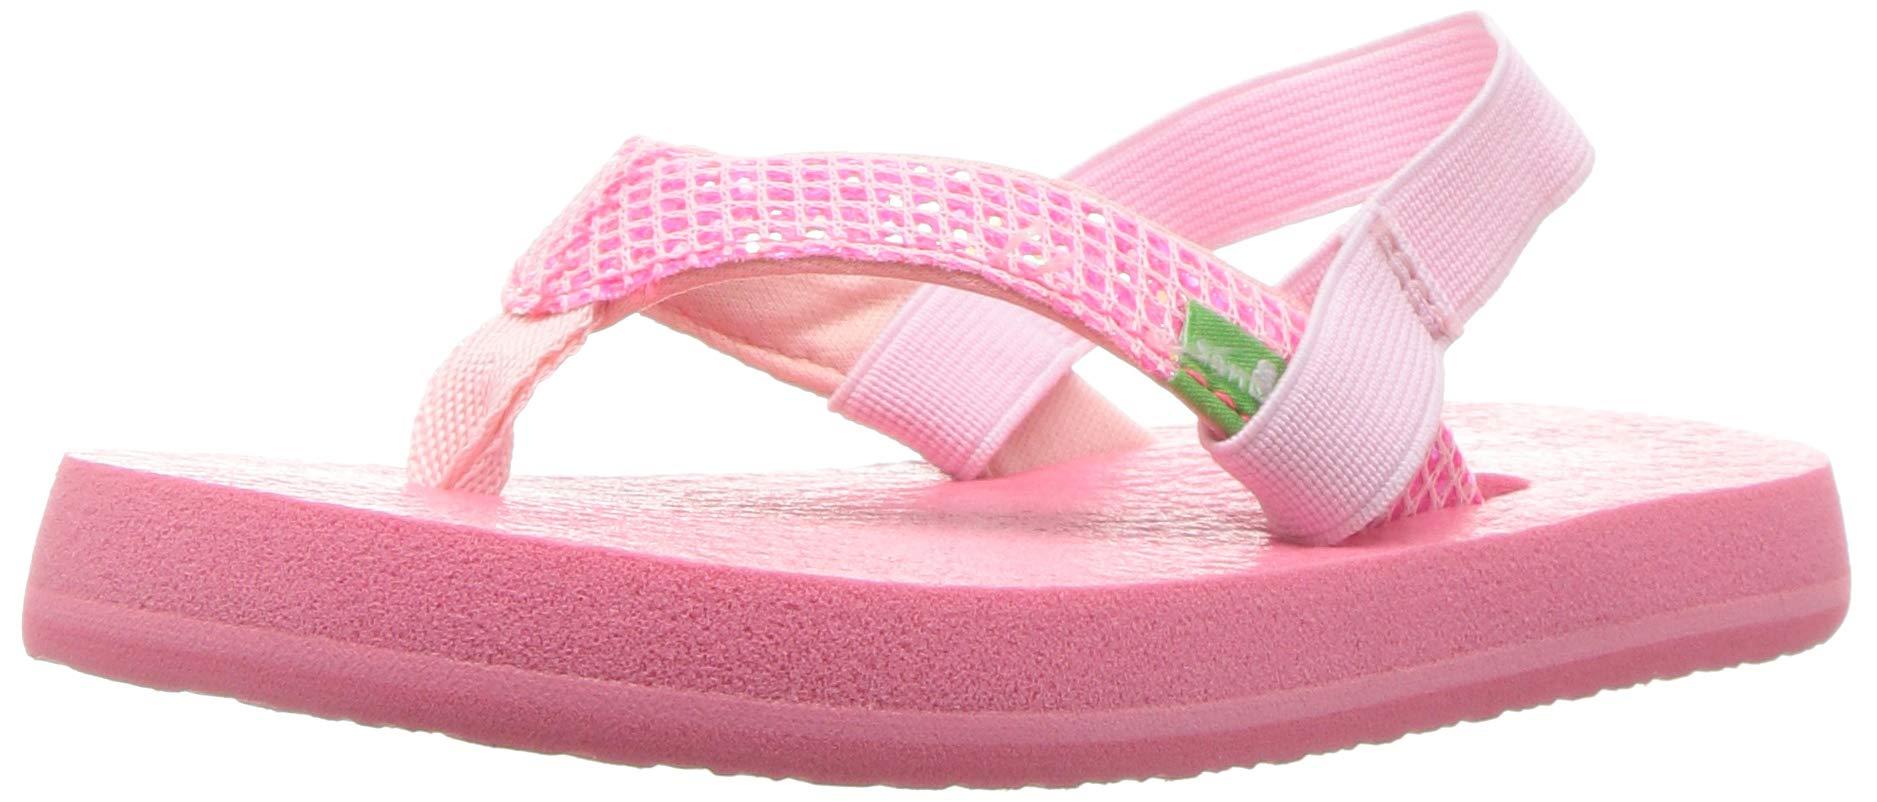 Sanuk Kids Girls' Yoga Glitter Flip-Flop Paradise Pink - with Strap 9/10 M US Toddler